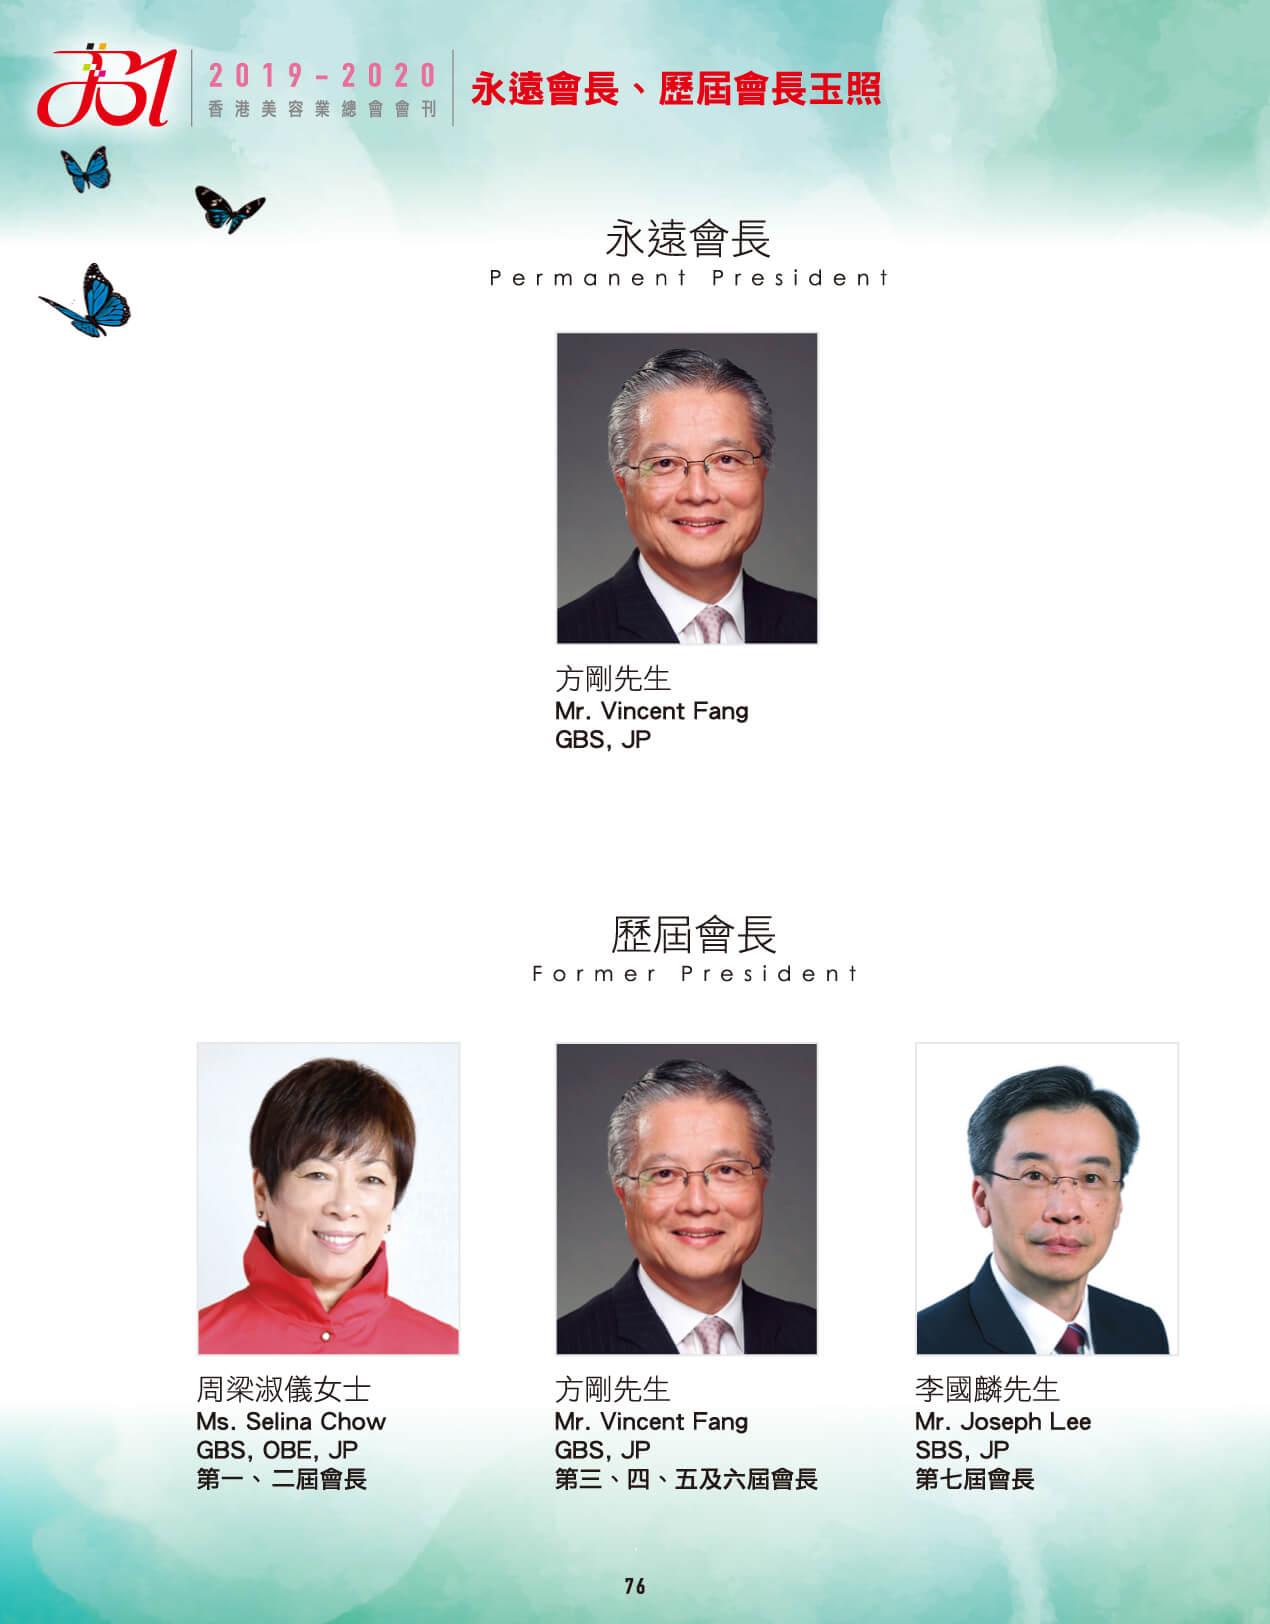 P076-077-2019-2020-FBi-Chairman-op-1